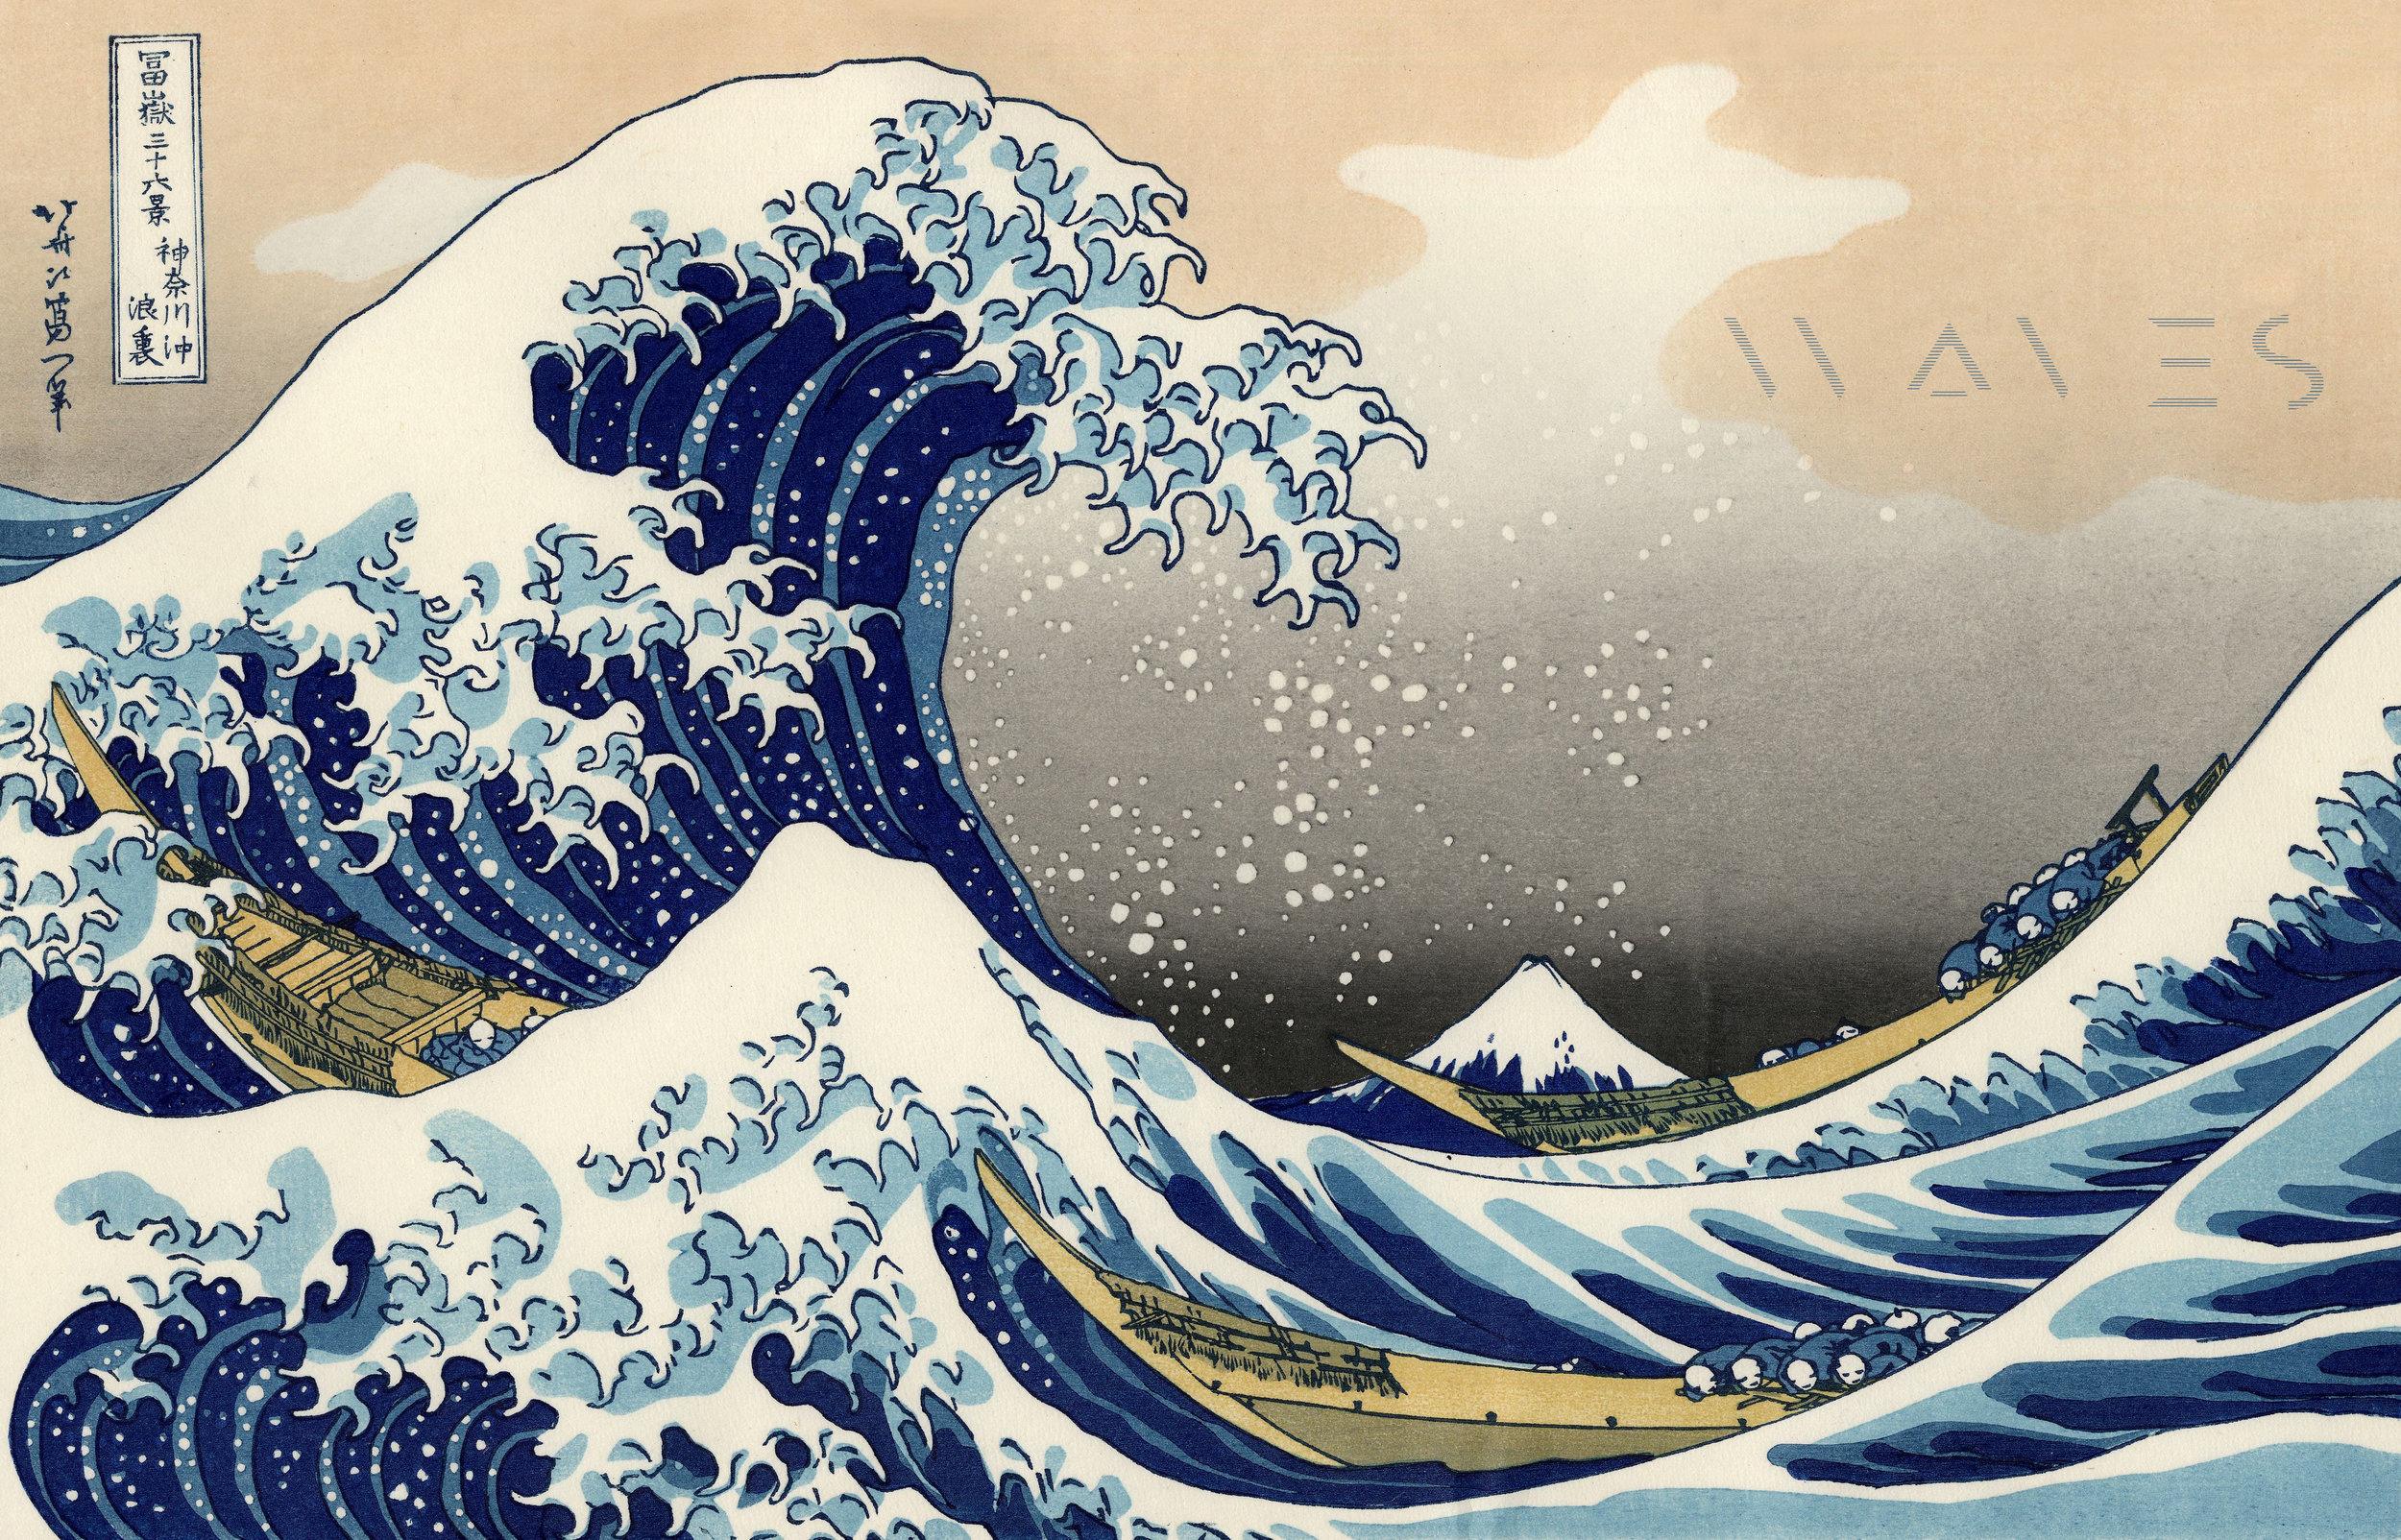 Waves Zine Vanessa Pelz Sharpe